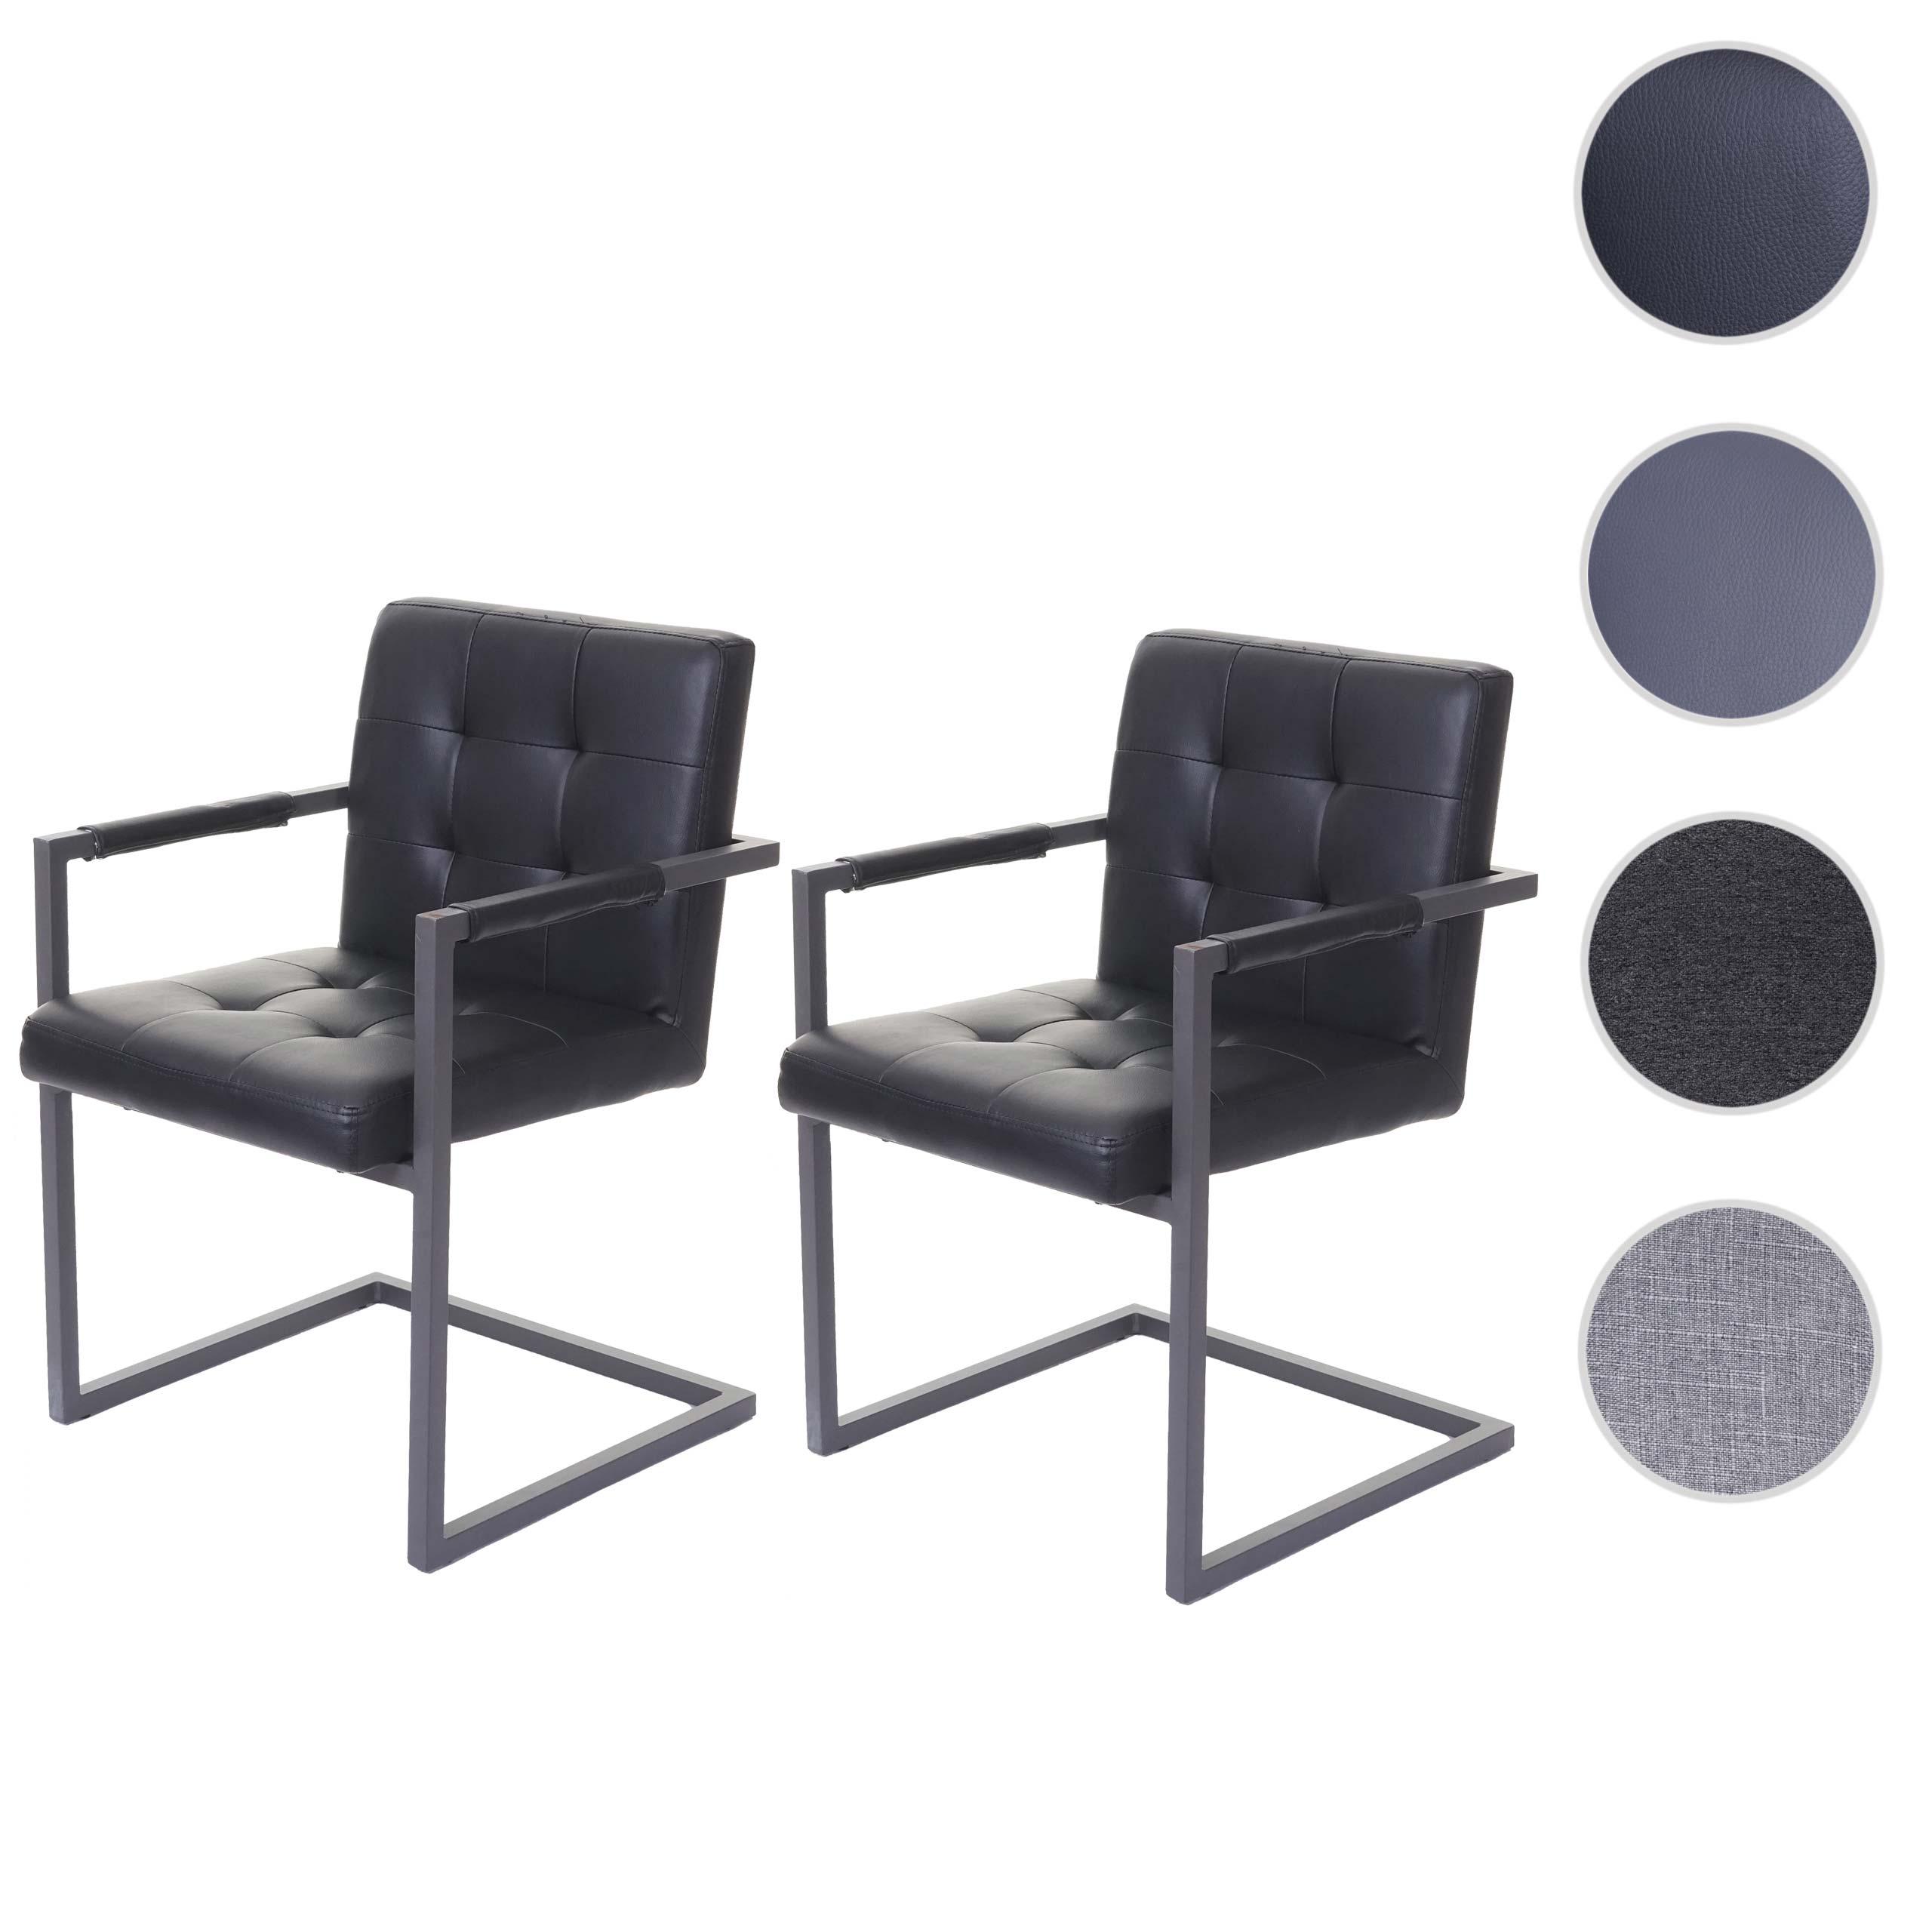 2x Esszimmerstuhl HWC-D33, Freischwinger Küchenstuhl, Vintage ' Kunstleder, grau